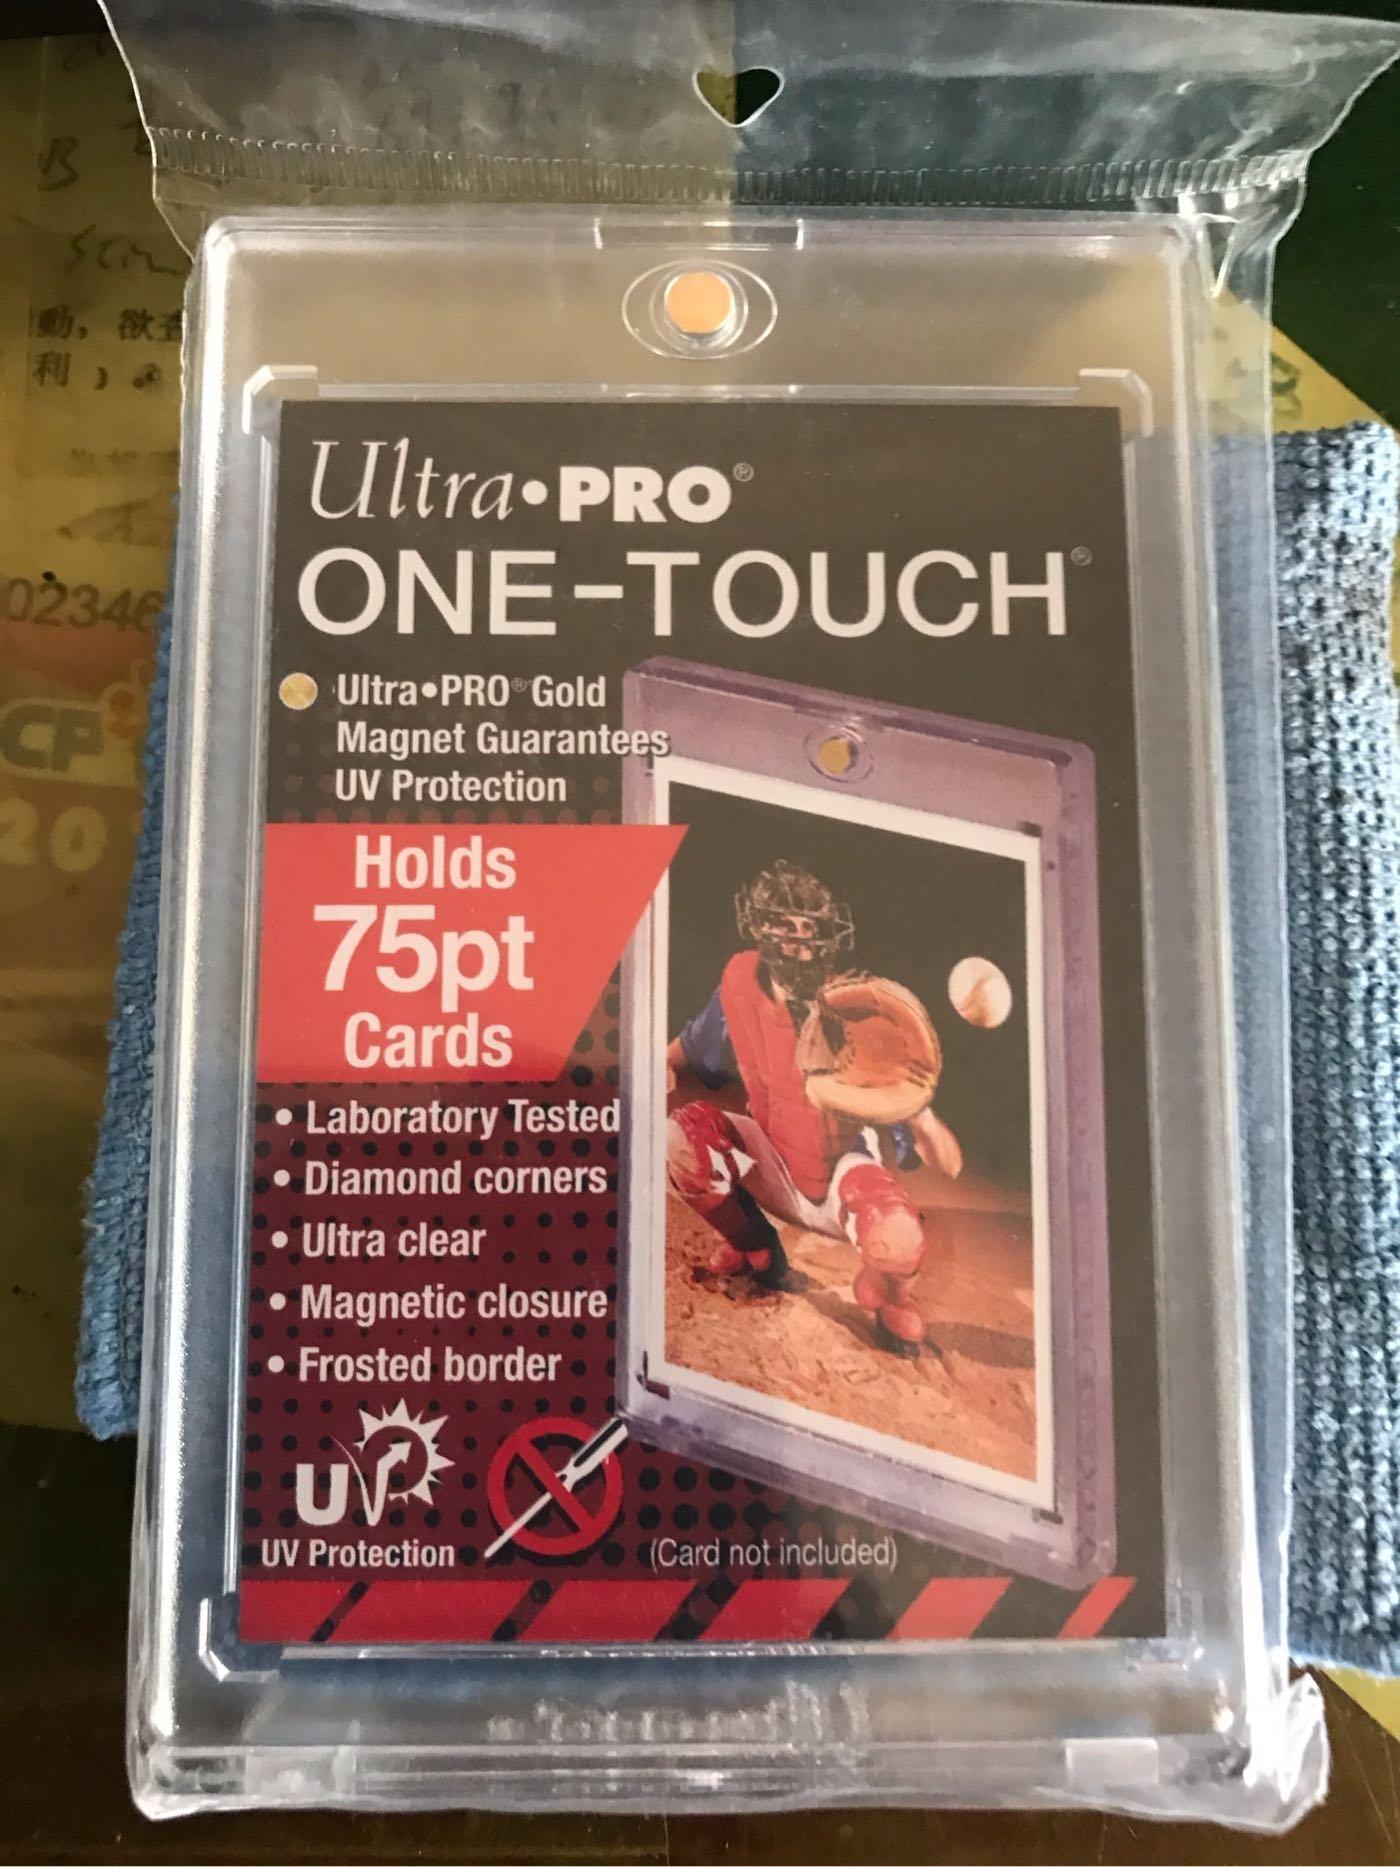 Ultra Pro 75PT 抗UV磁吸式卡夾 中華職棒球員卡 遊戲王 寶可夢PTCG 漫威 甲蟲王者 NBA MLB